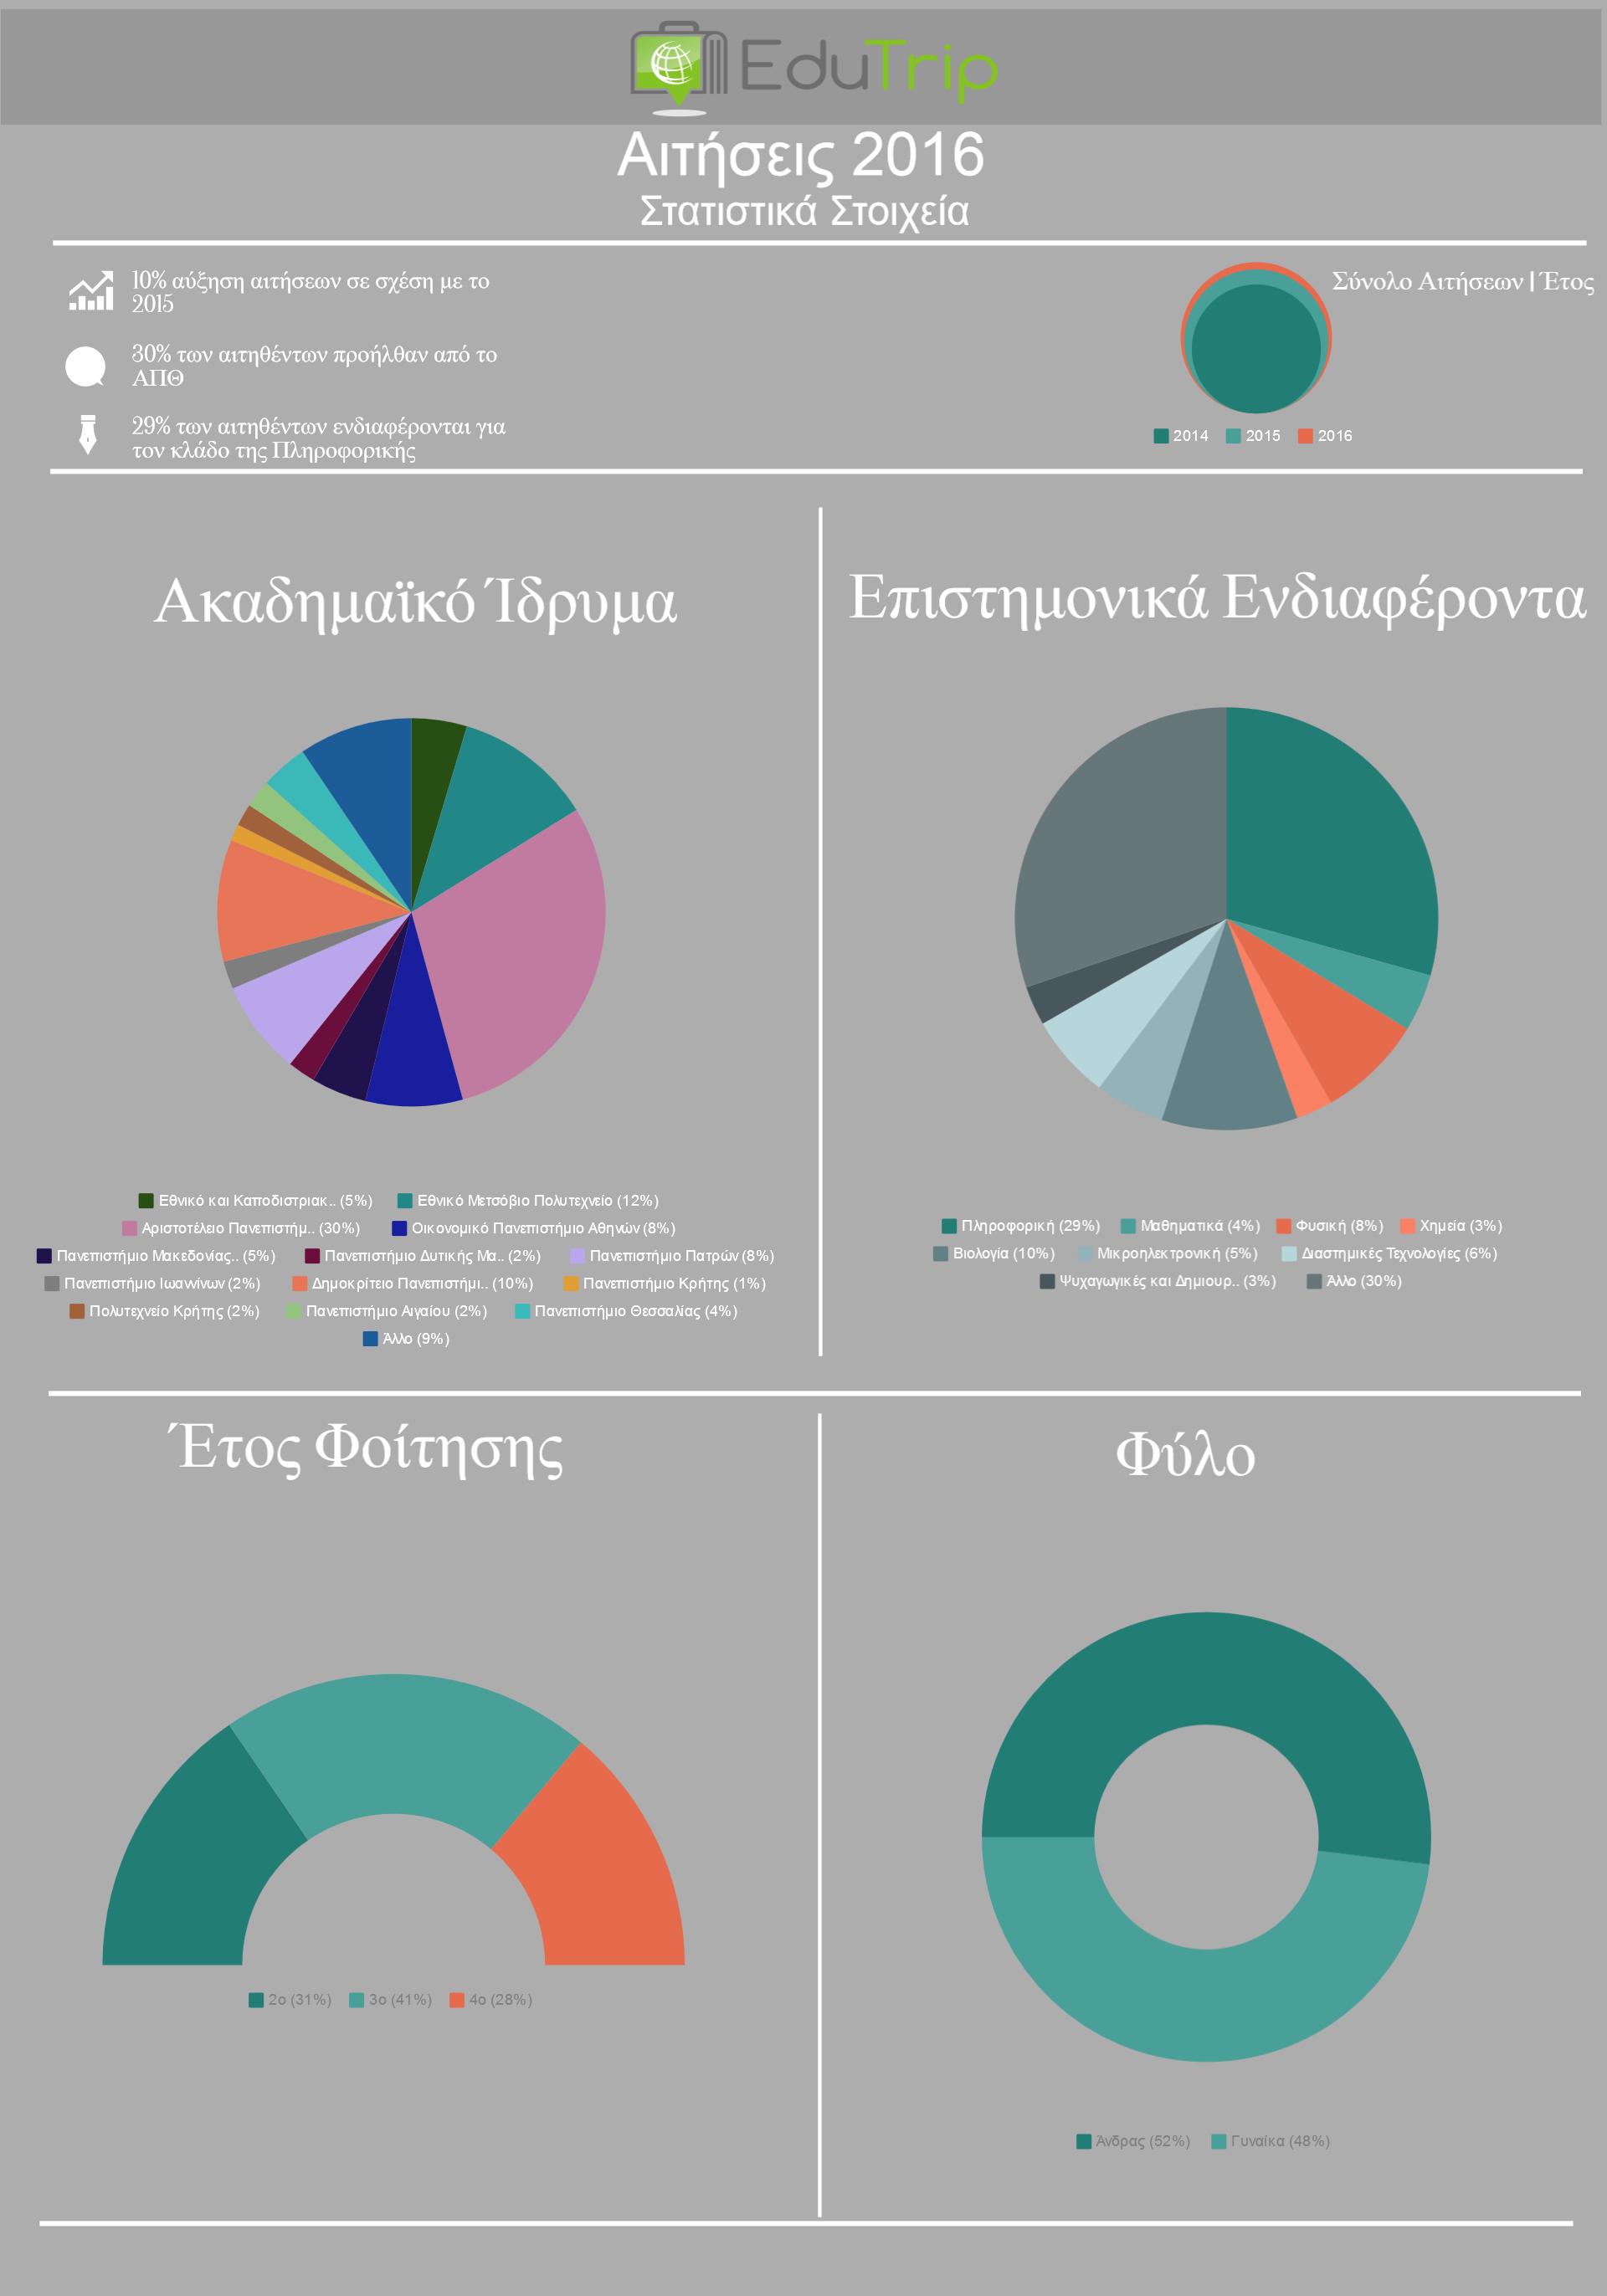 Edutrip2016-Infographic